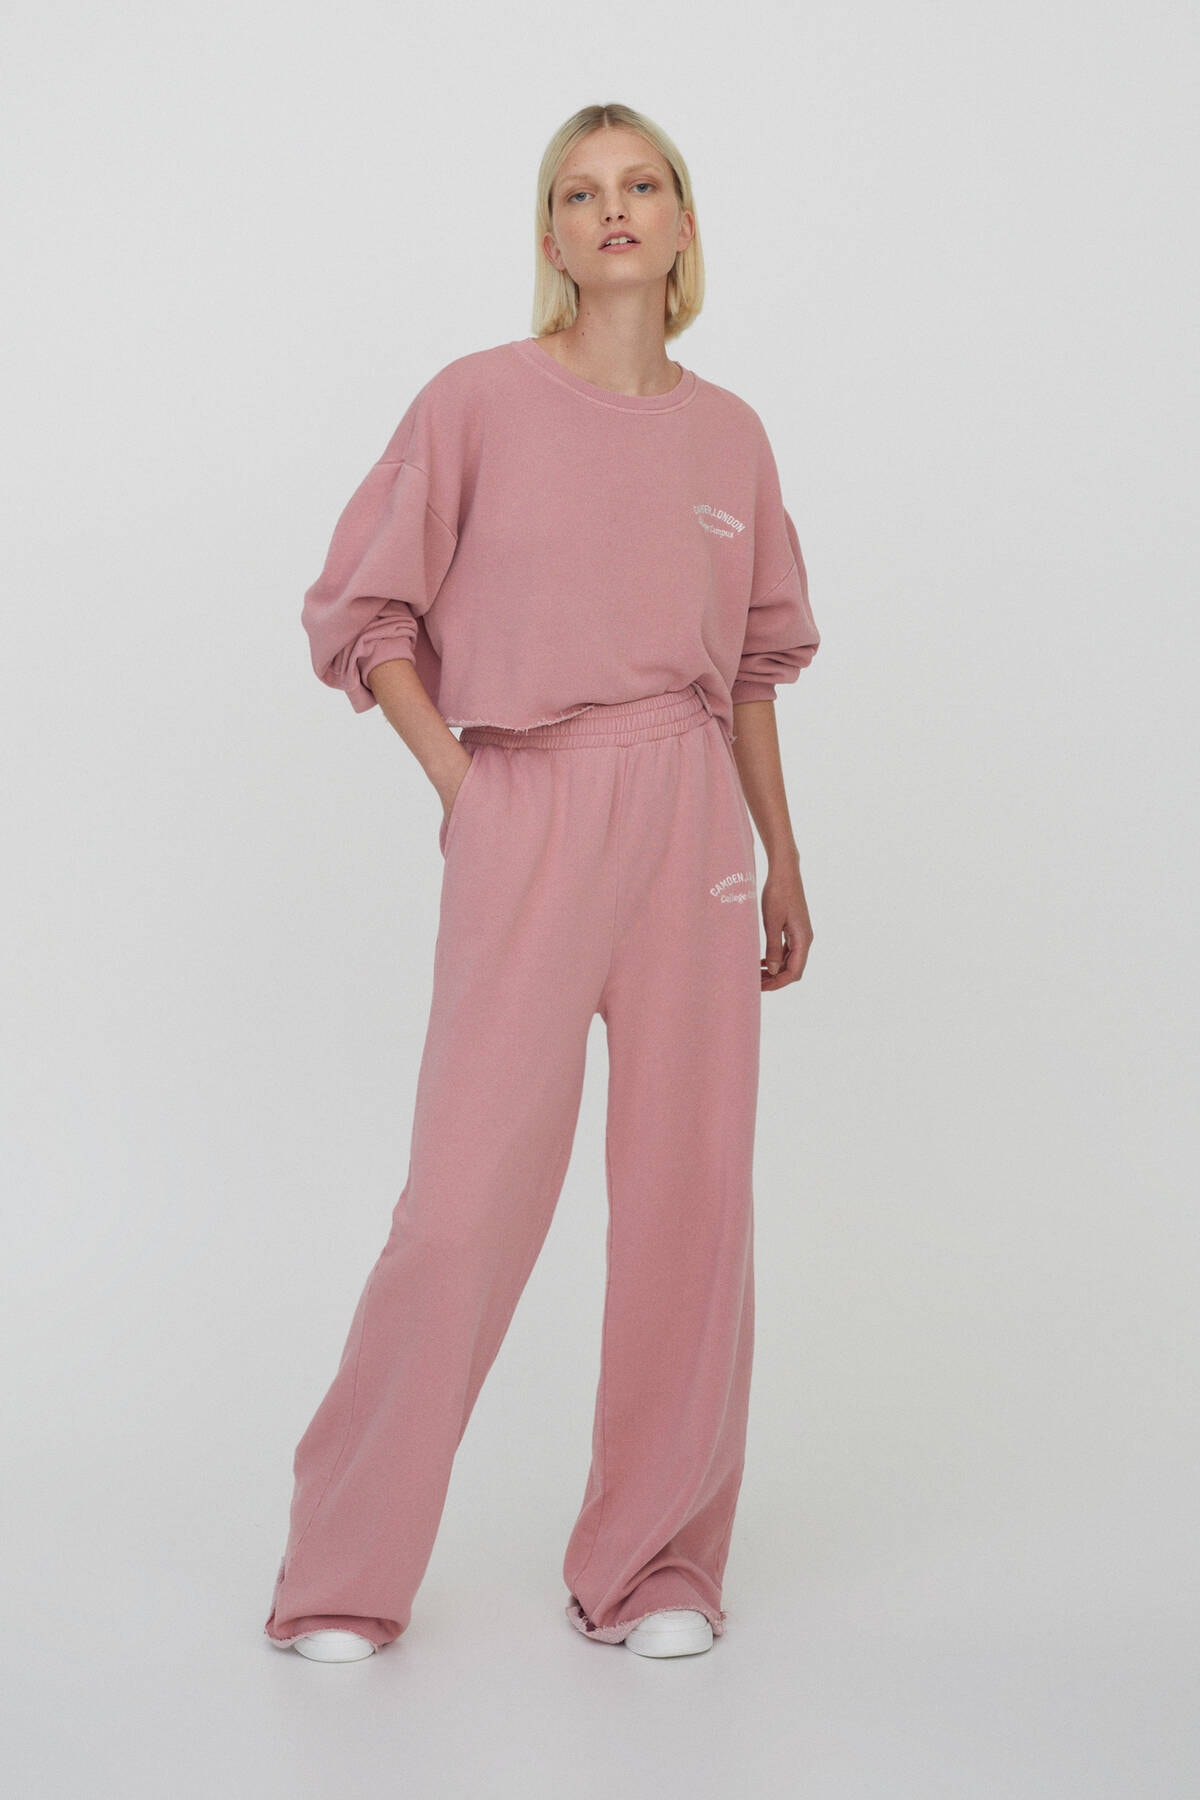 Pull & Bear Kadın Pembe Slogan İşlemeli Jogging Fit Pantolon 04676340 0